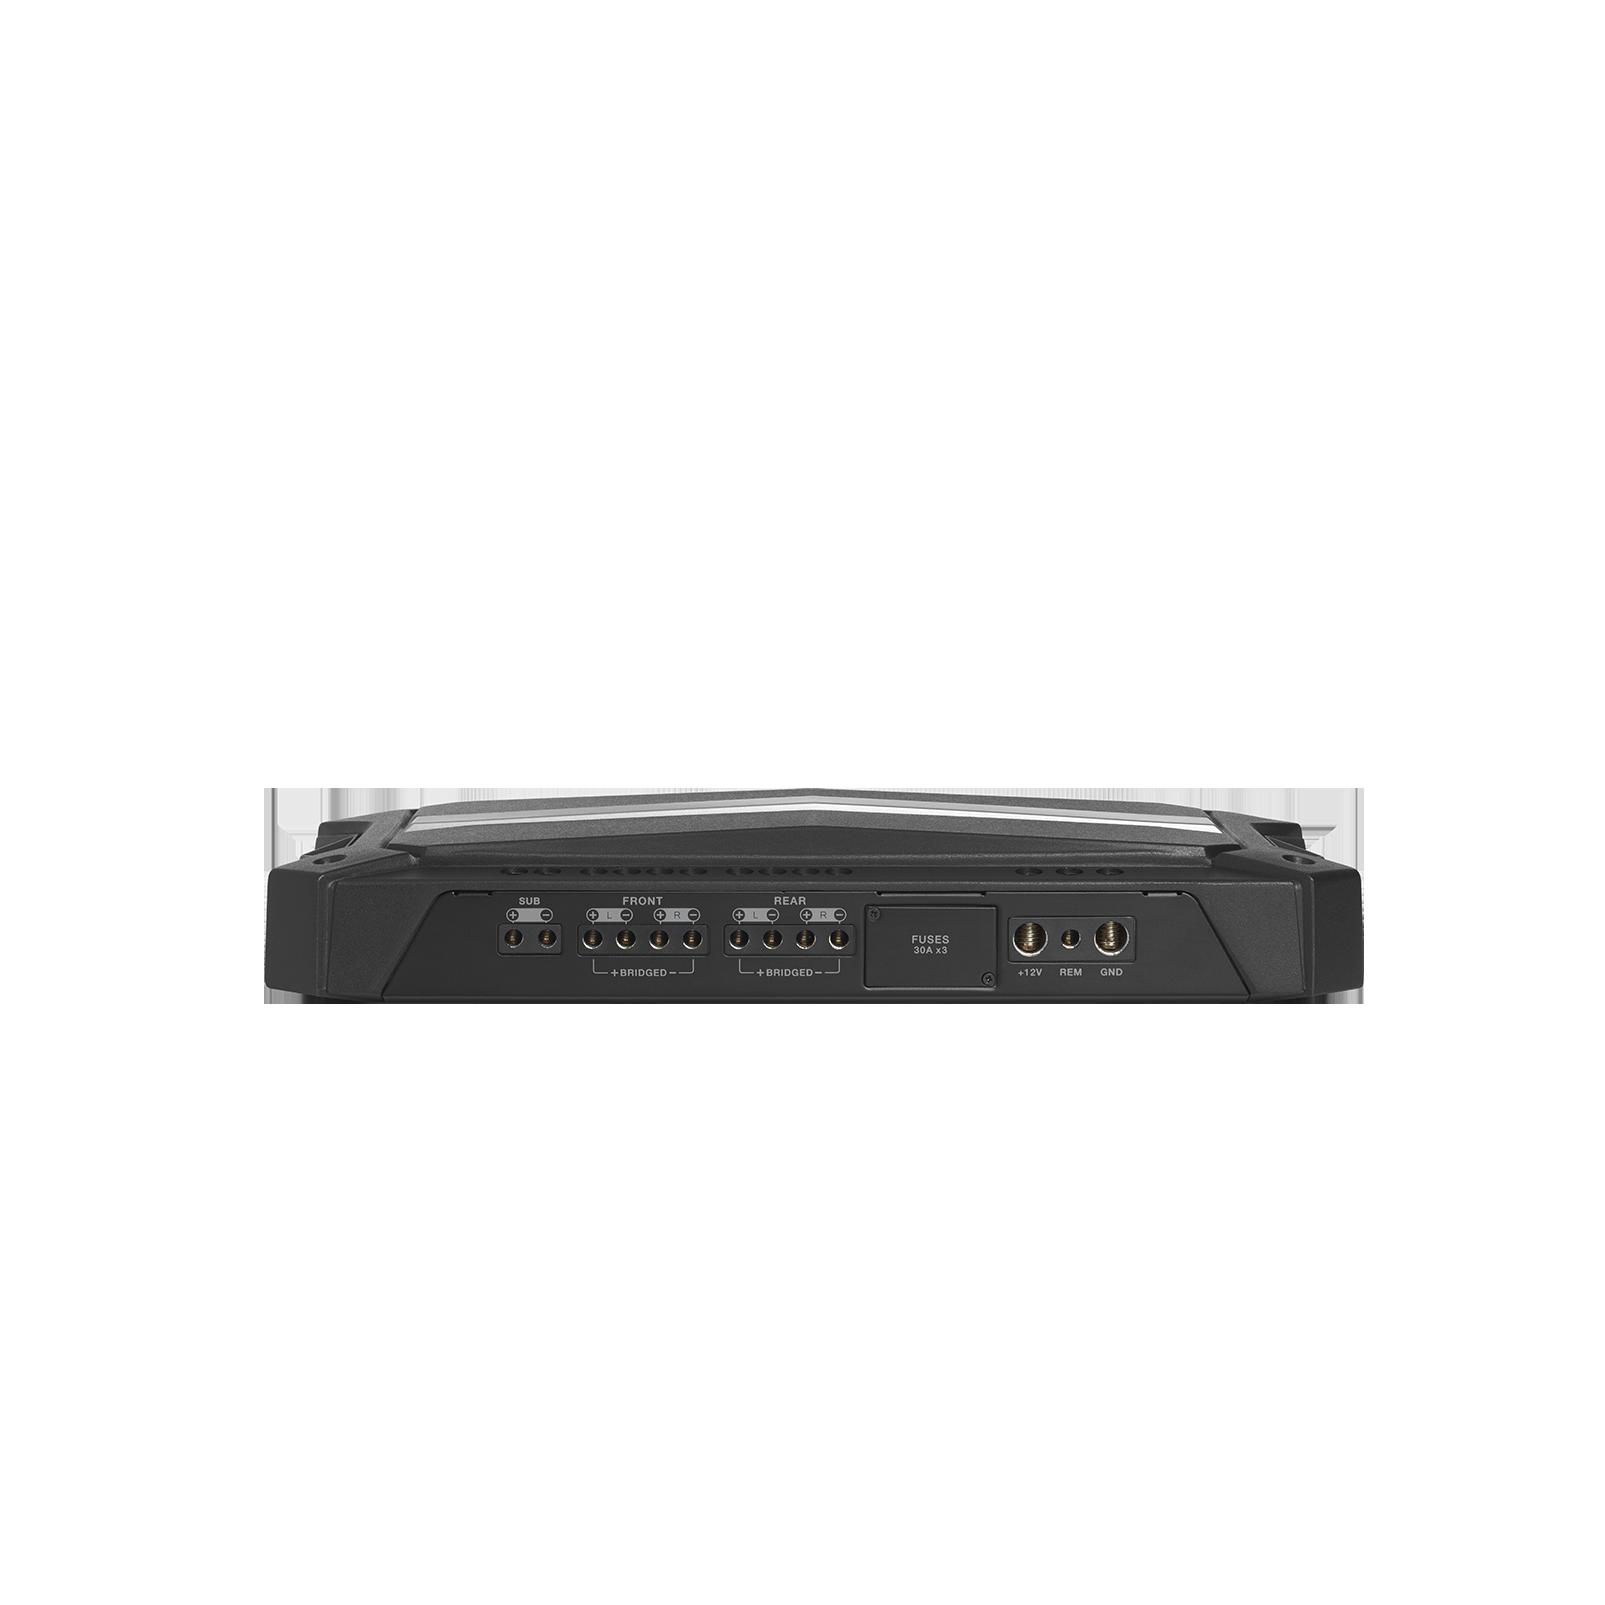 Stadium 5 - Black - High-performance multi-channel Class D amplifier - Detailshot 1